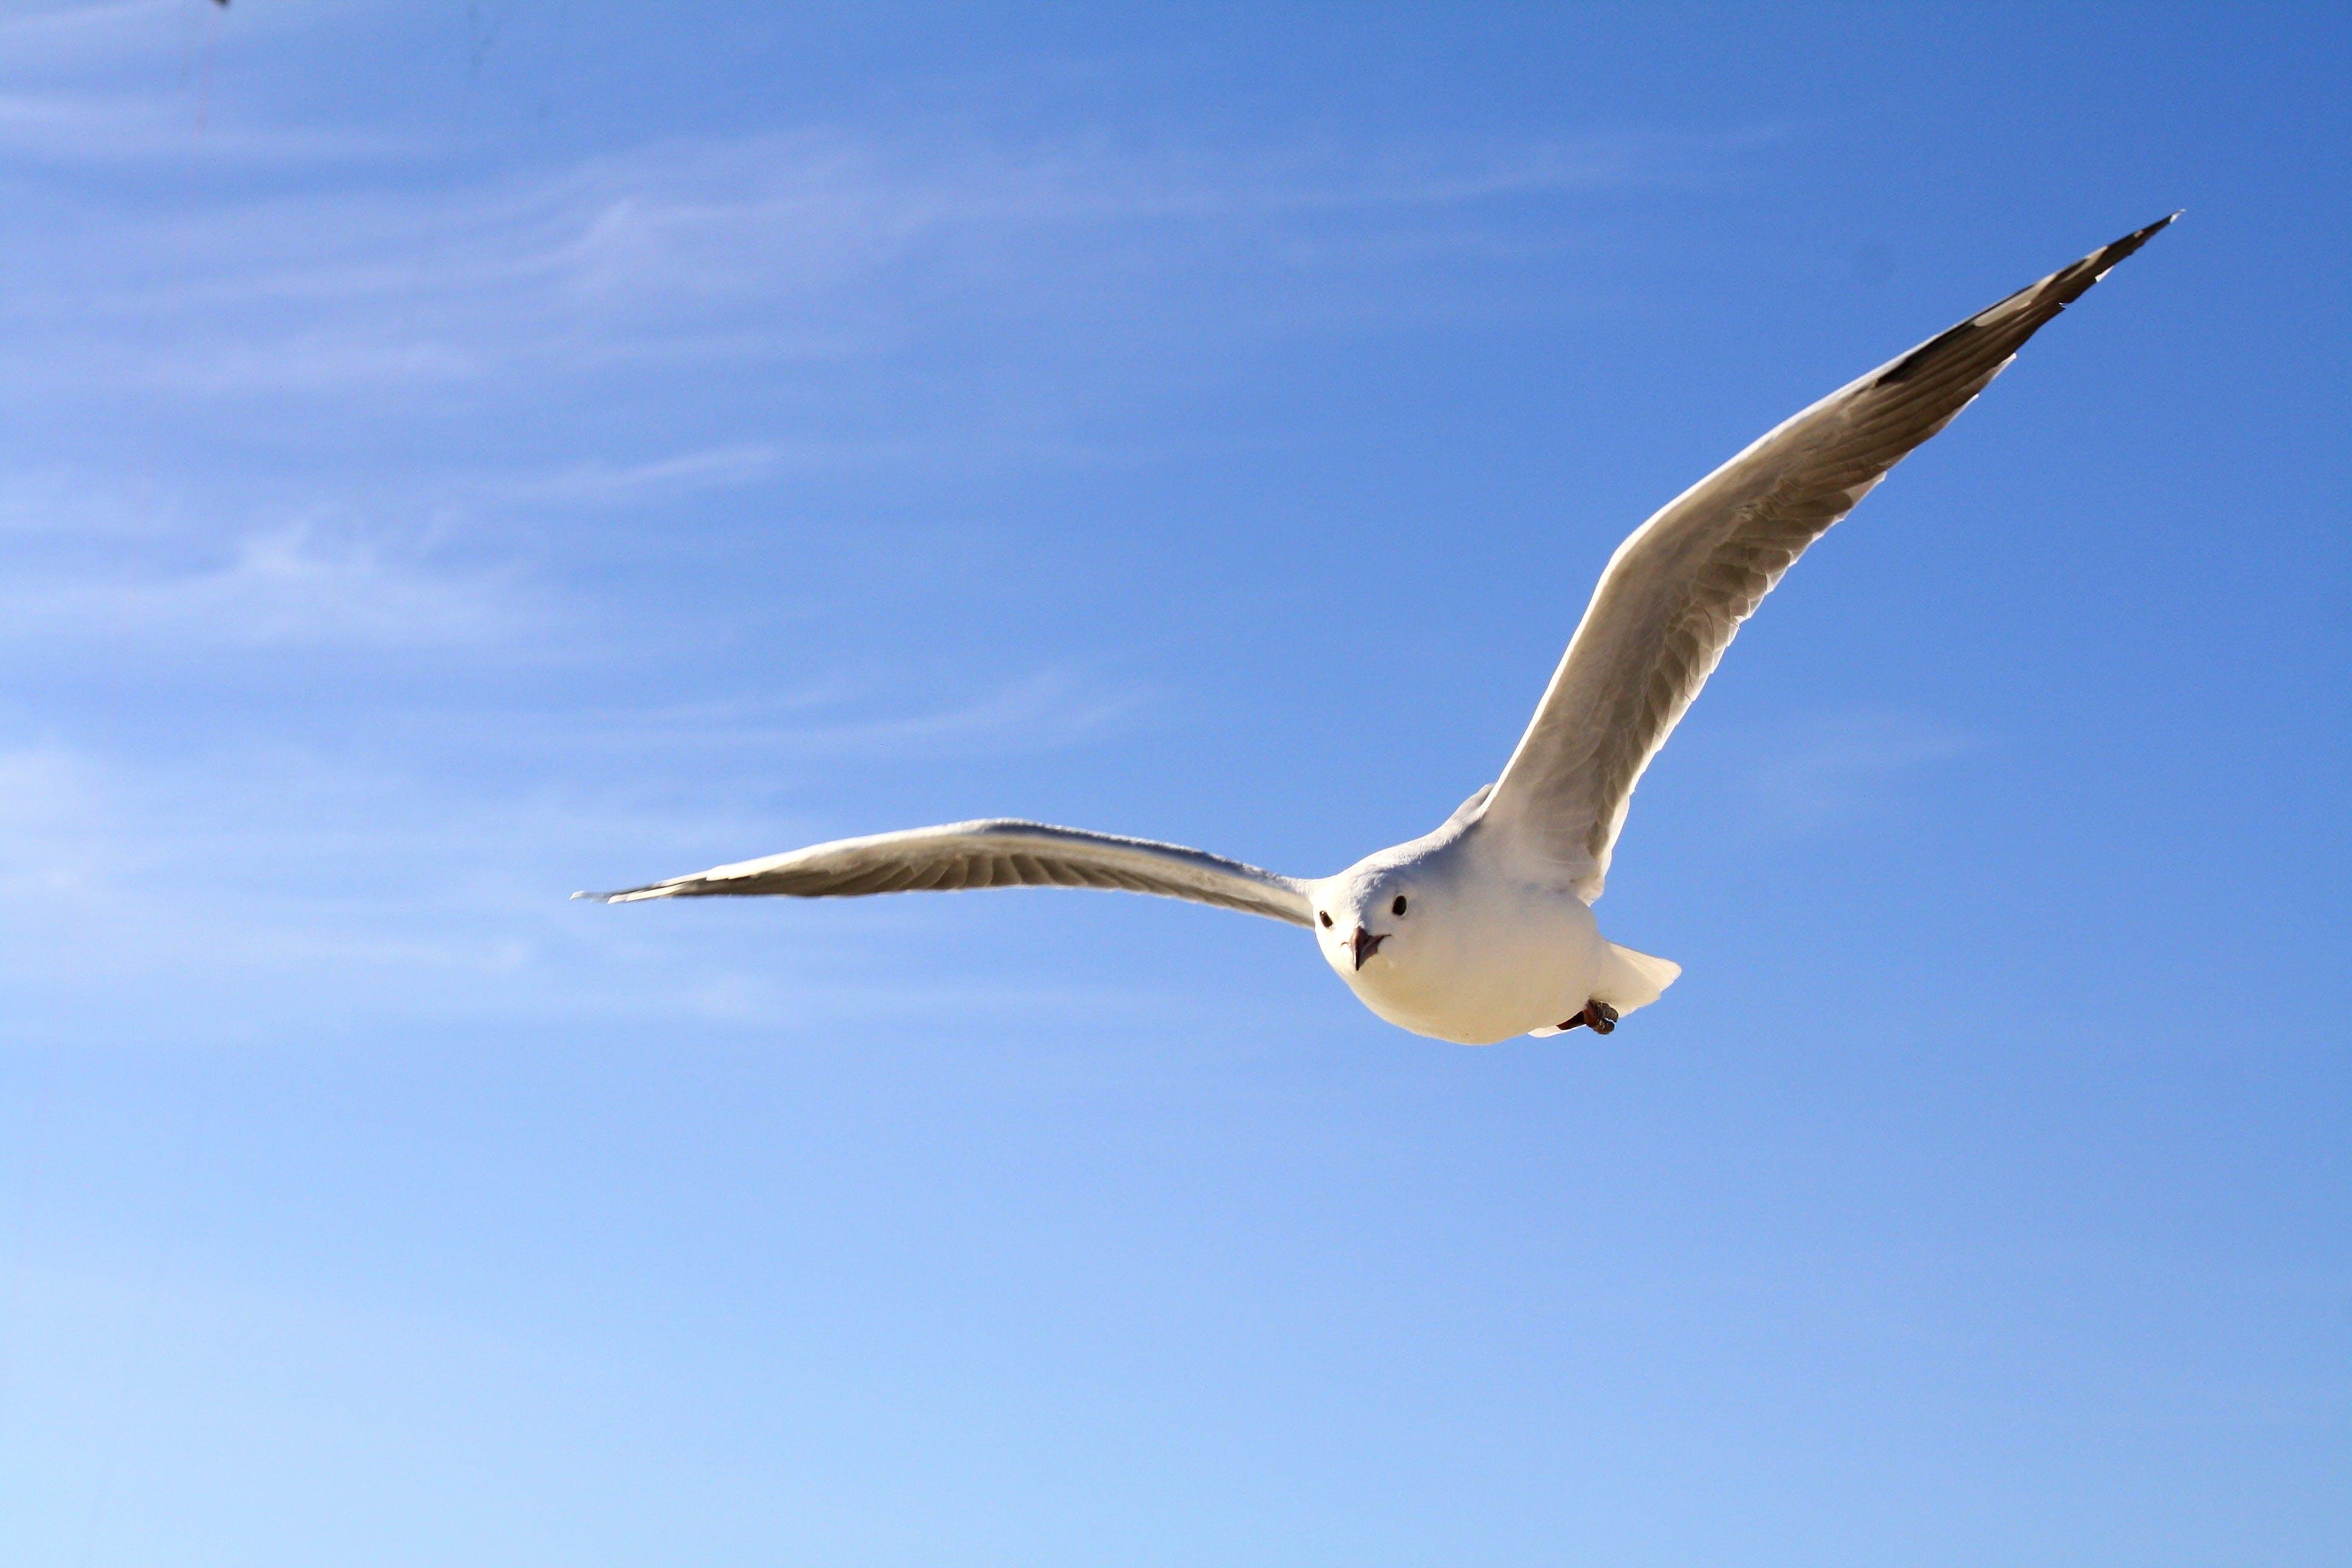 Kostenloses Stock Foto zu himmel, vogel, fliegen, möwe